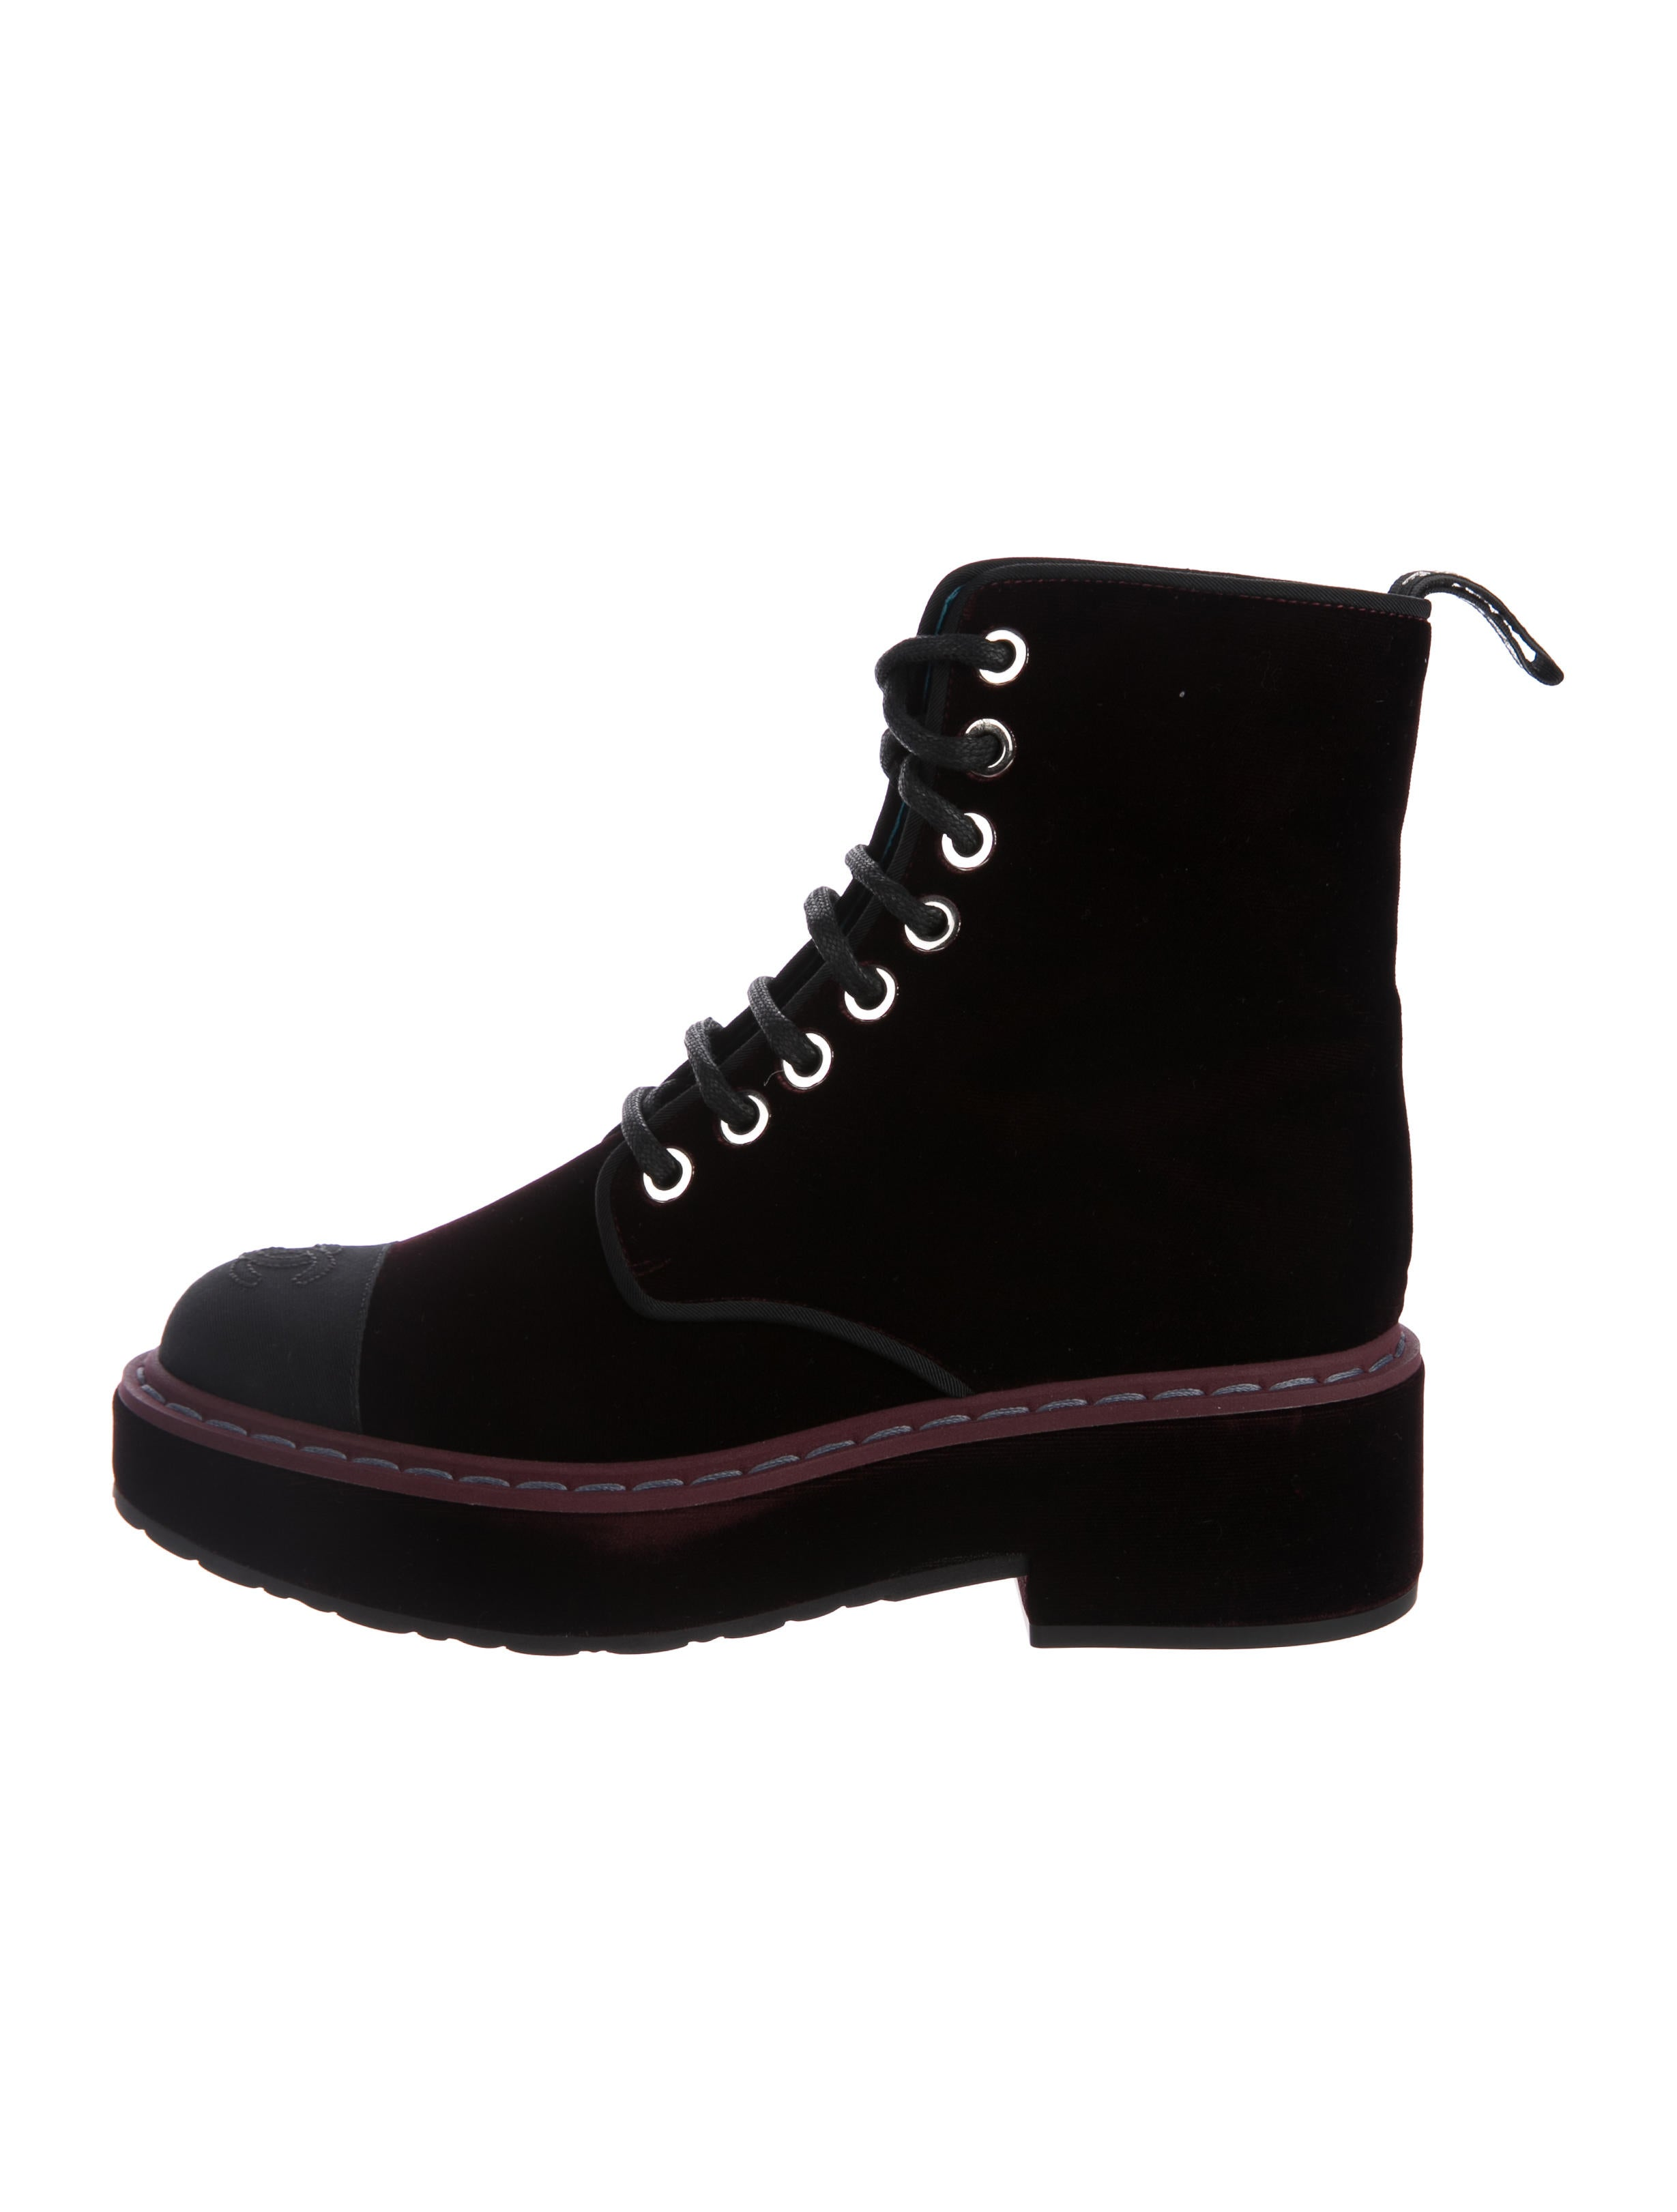 9fe6ec04b54e Chanel Velvet Combat Boots w  Tags - Shoes - CHA222516